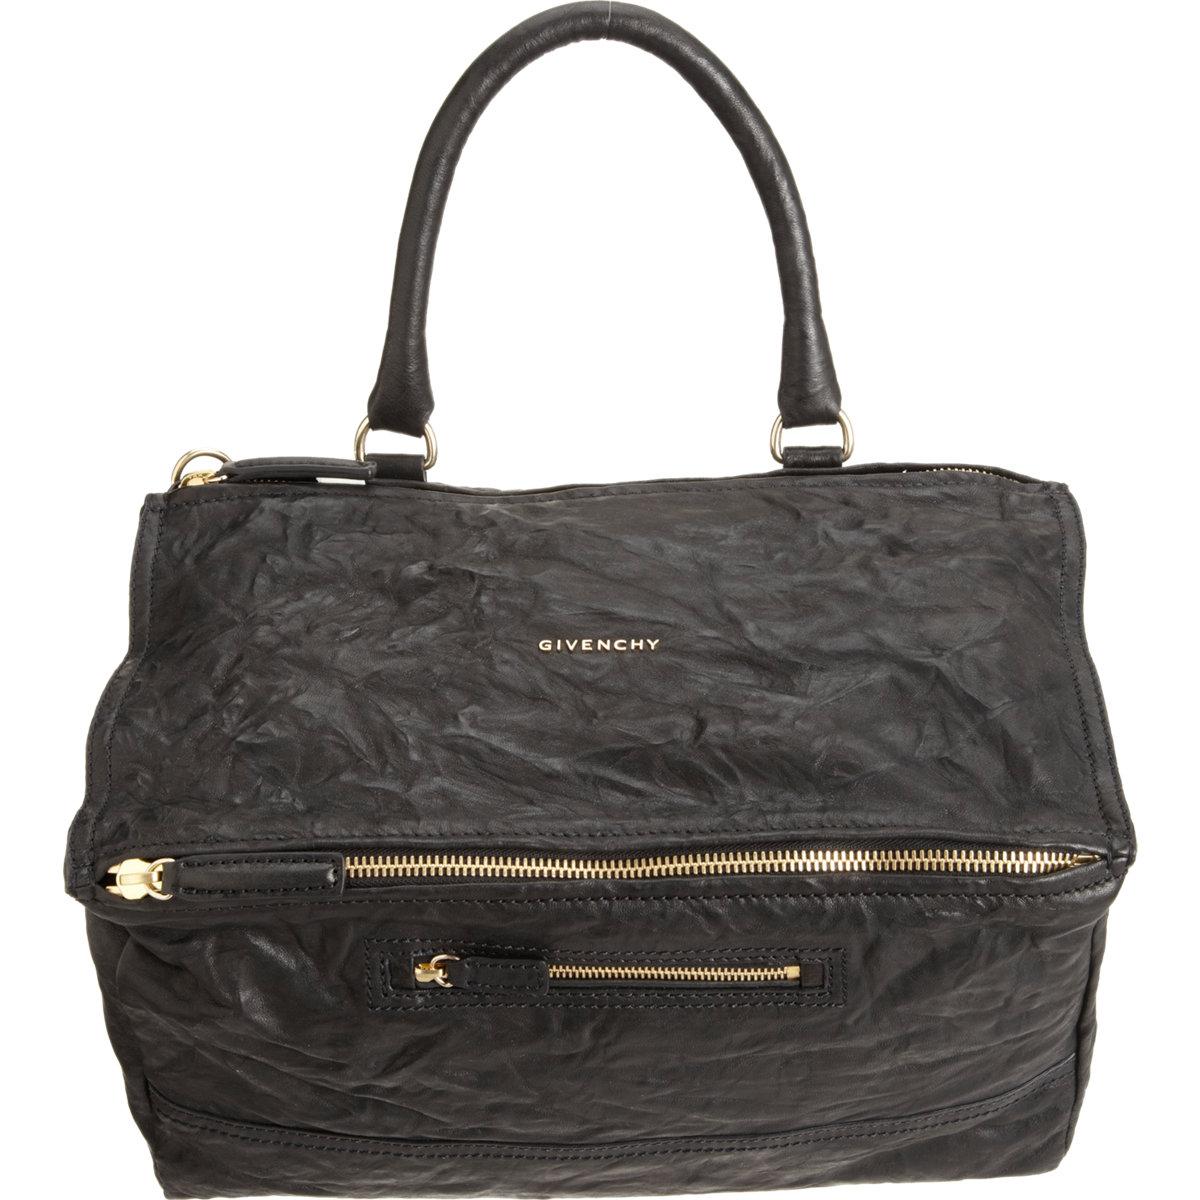 Givenchy Large Pepe Pandora Messenger at Barneys.com